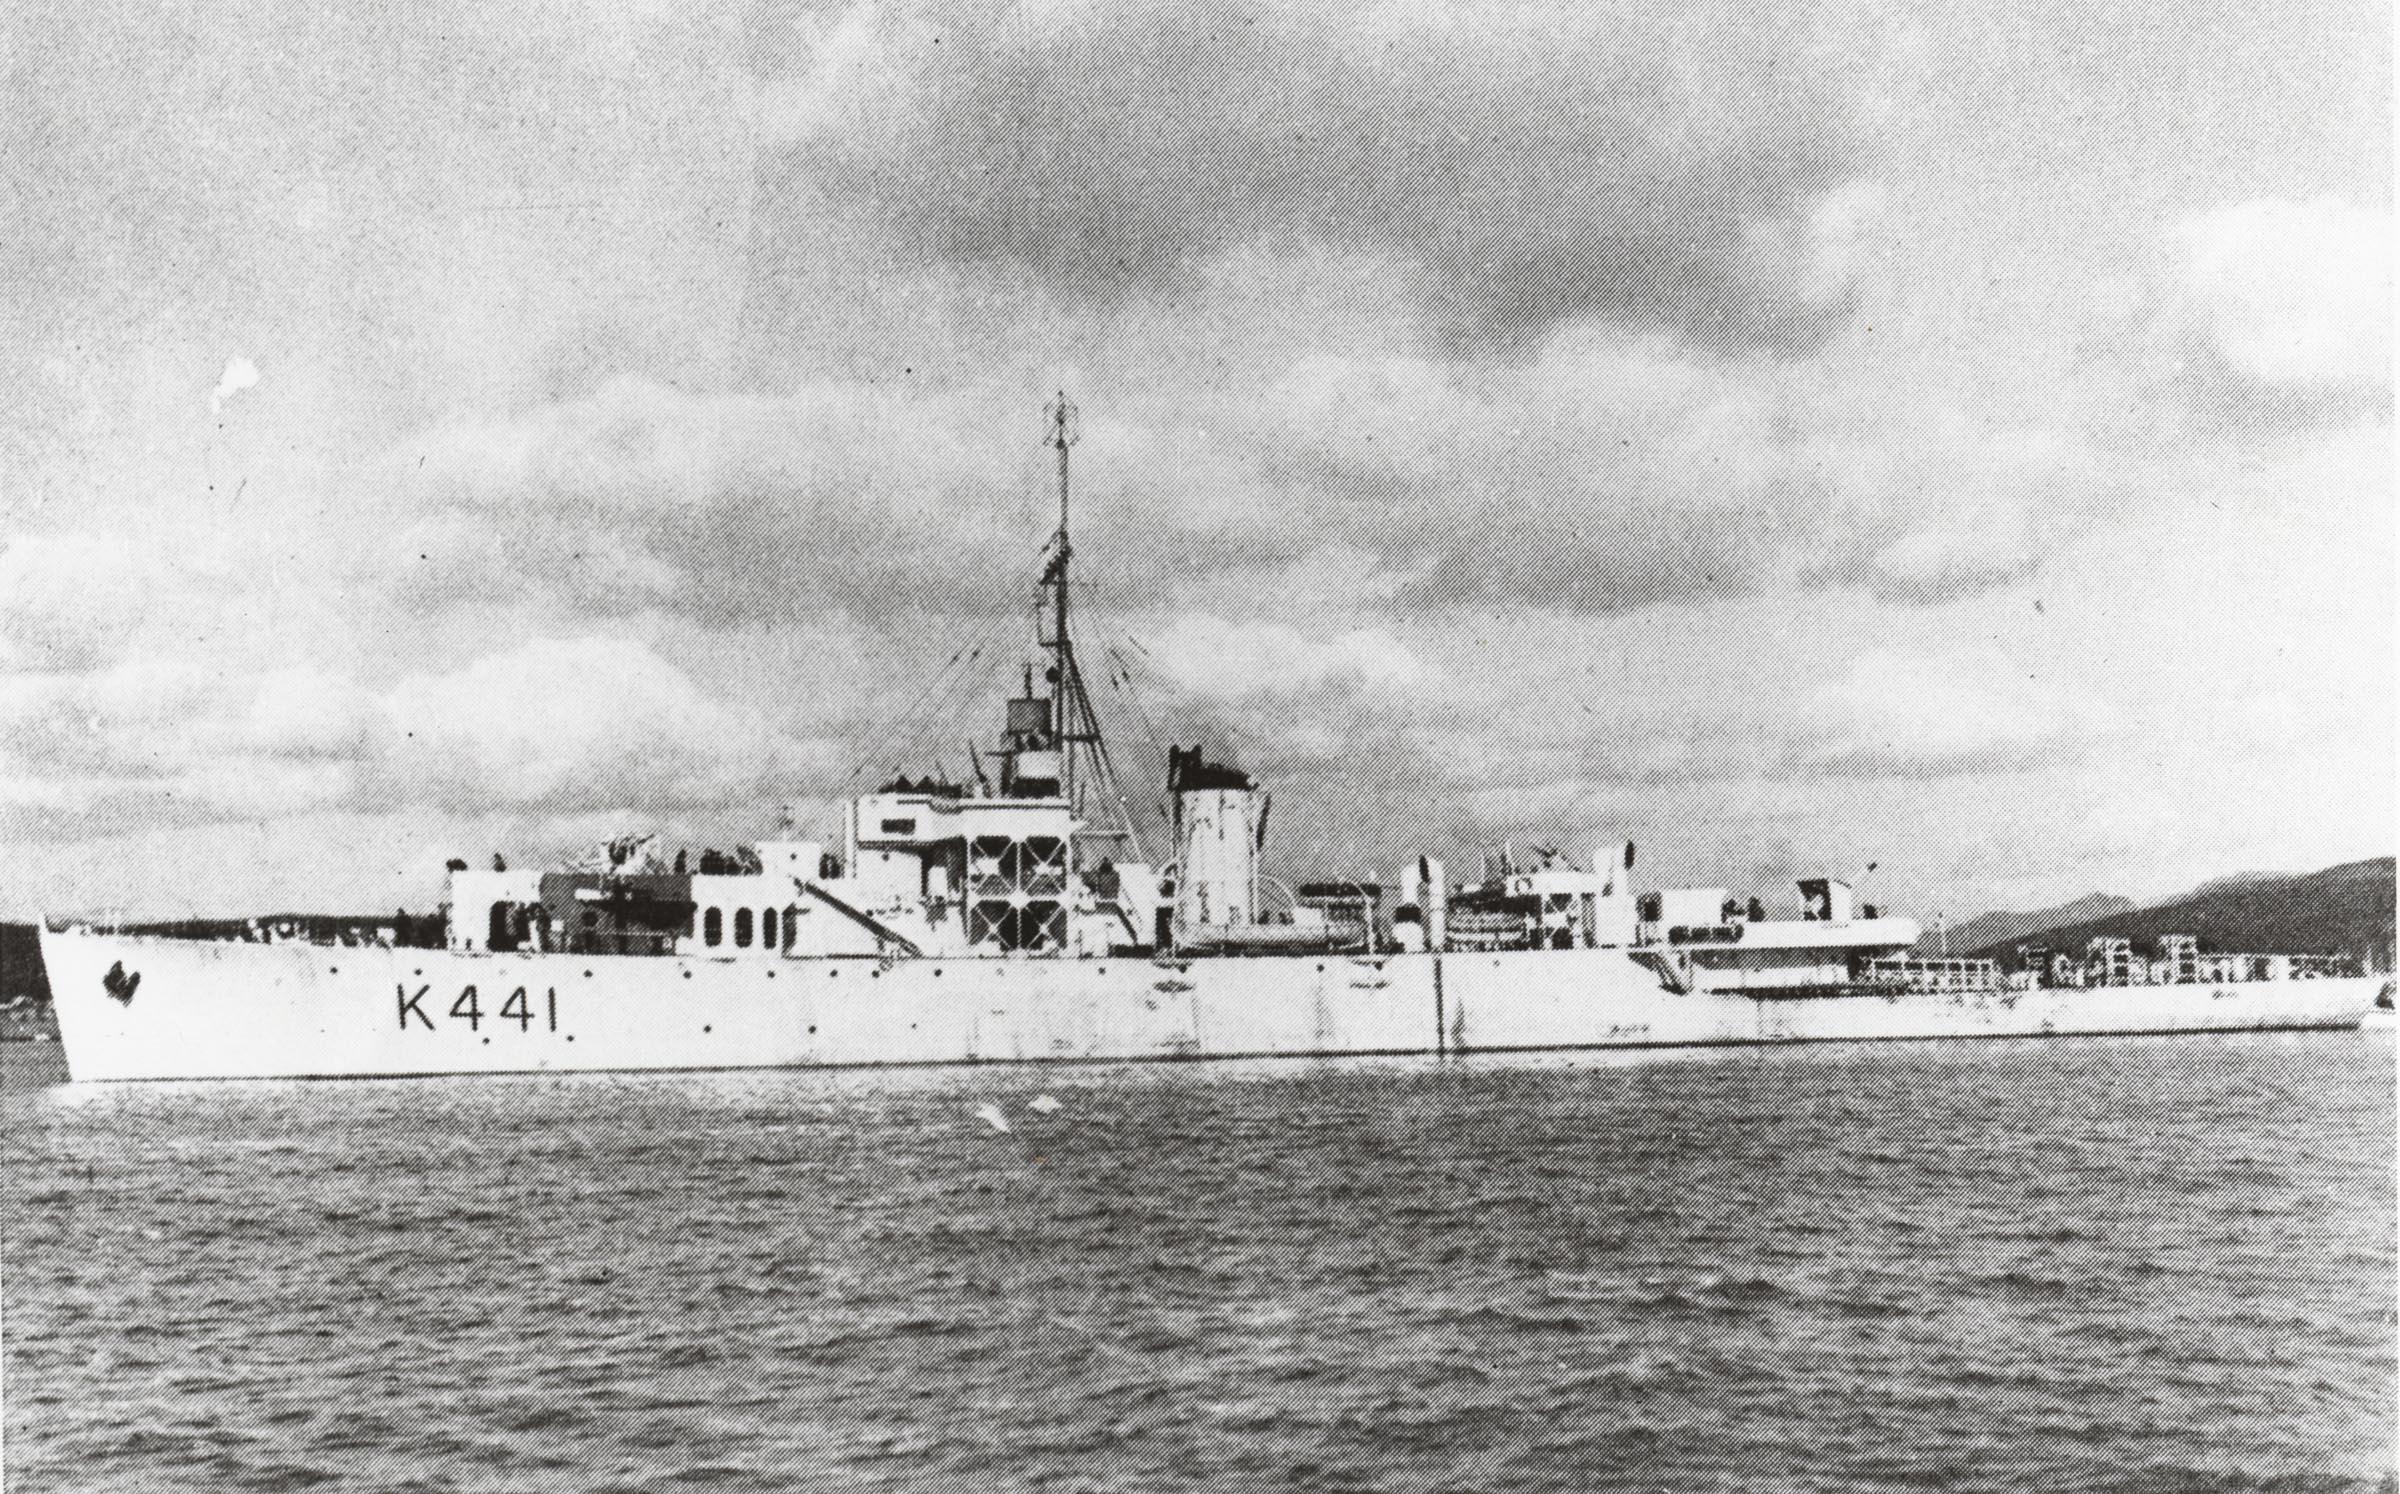 HMCS MONNOW